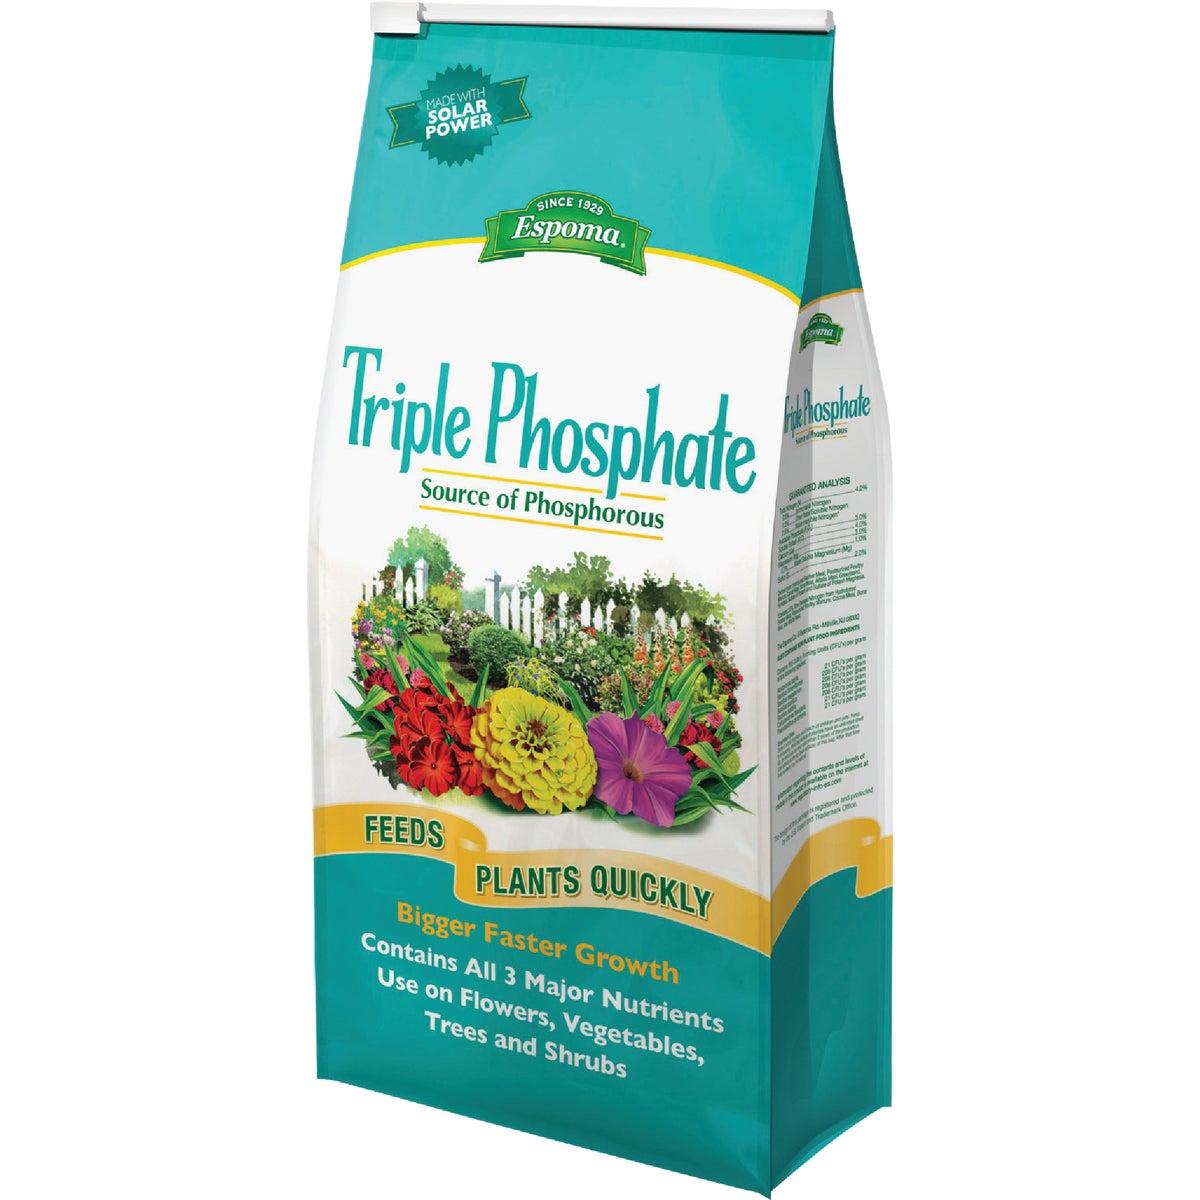 5LB TRIPLE PHOSPHATE - 66005 by Good Earth Organics